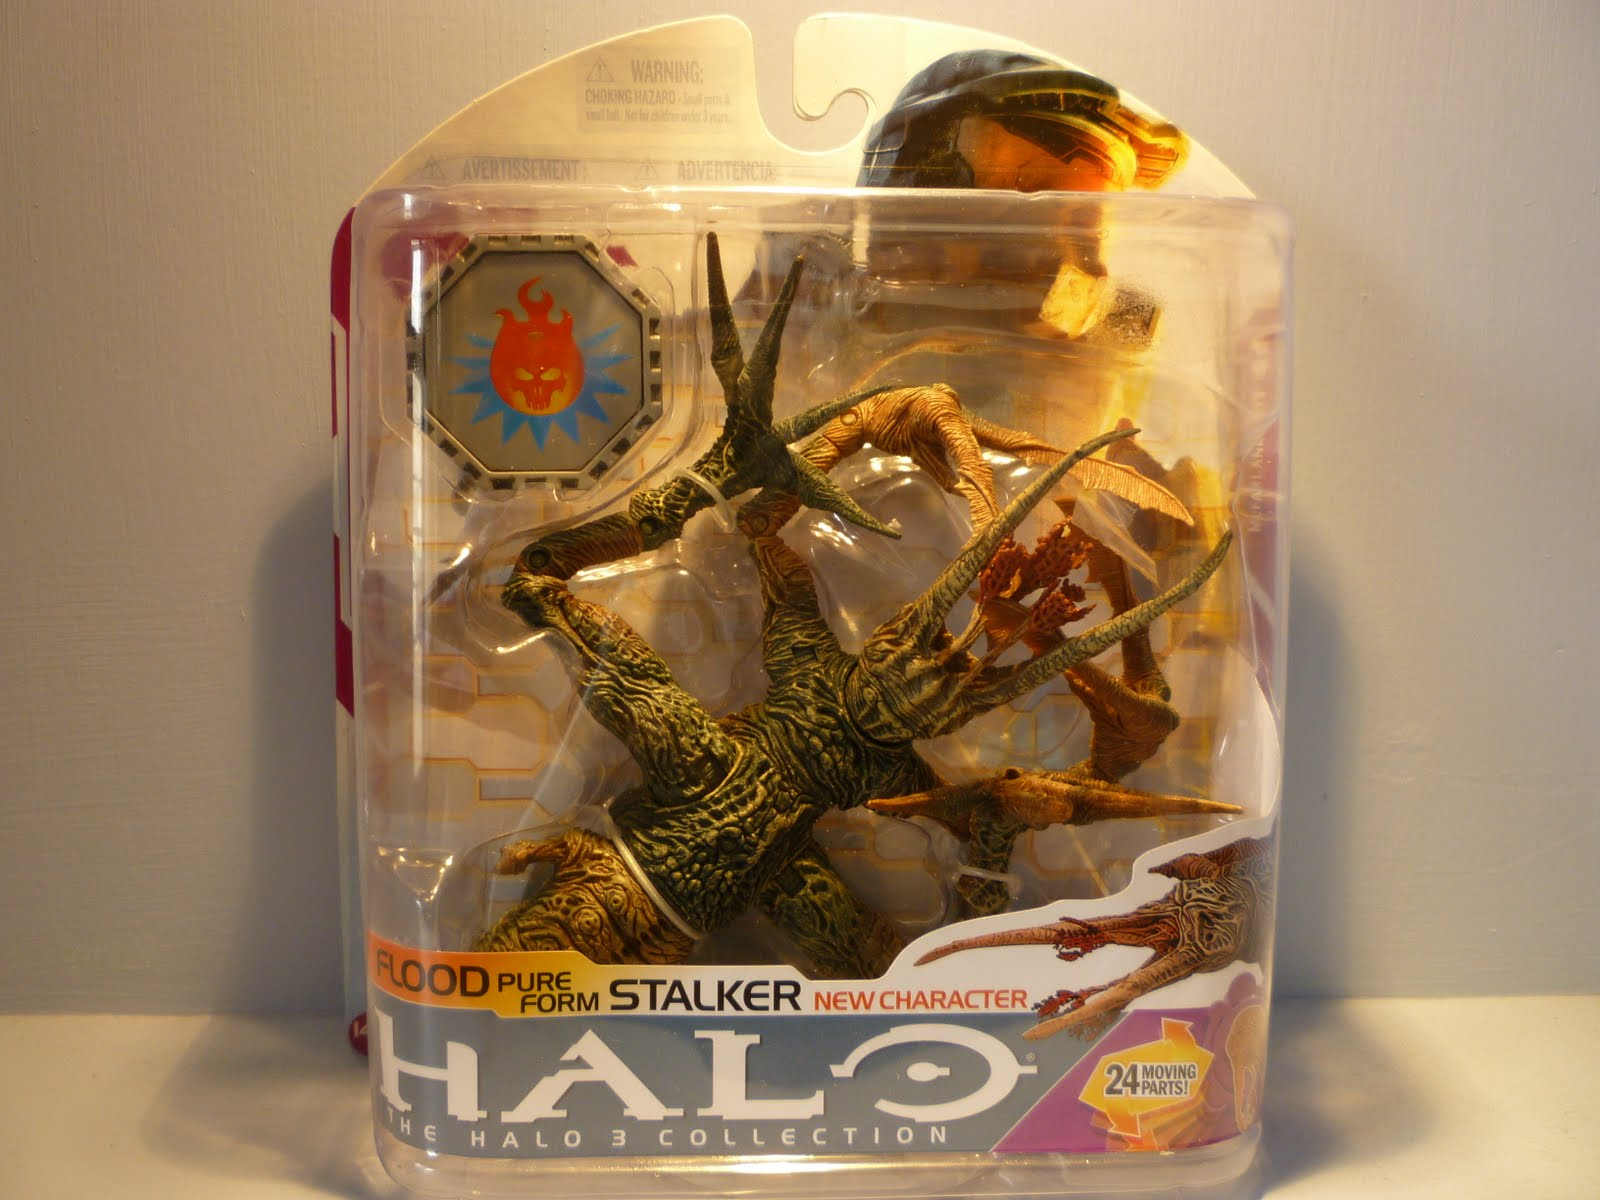 Kurobara: halo 3 Flood stalker pure form action figure